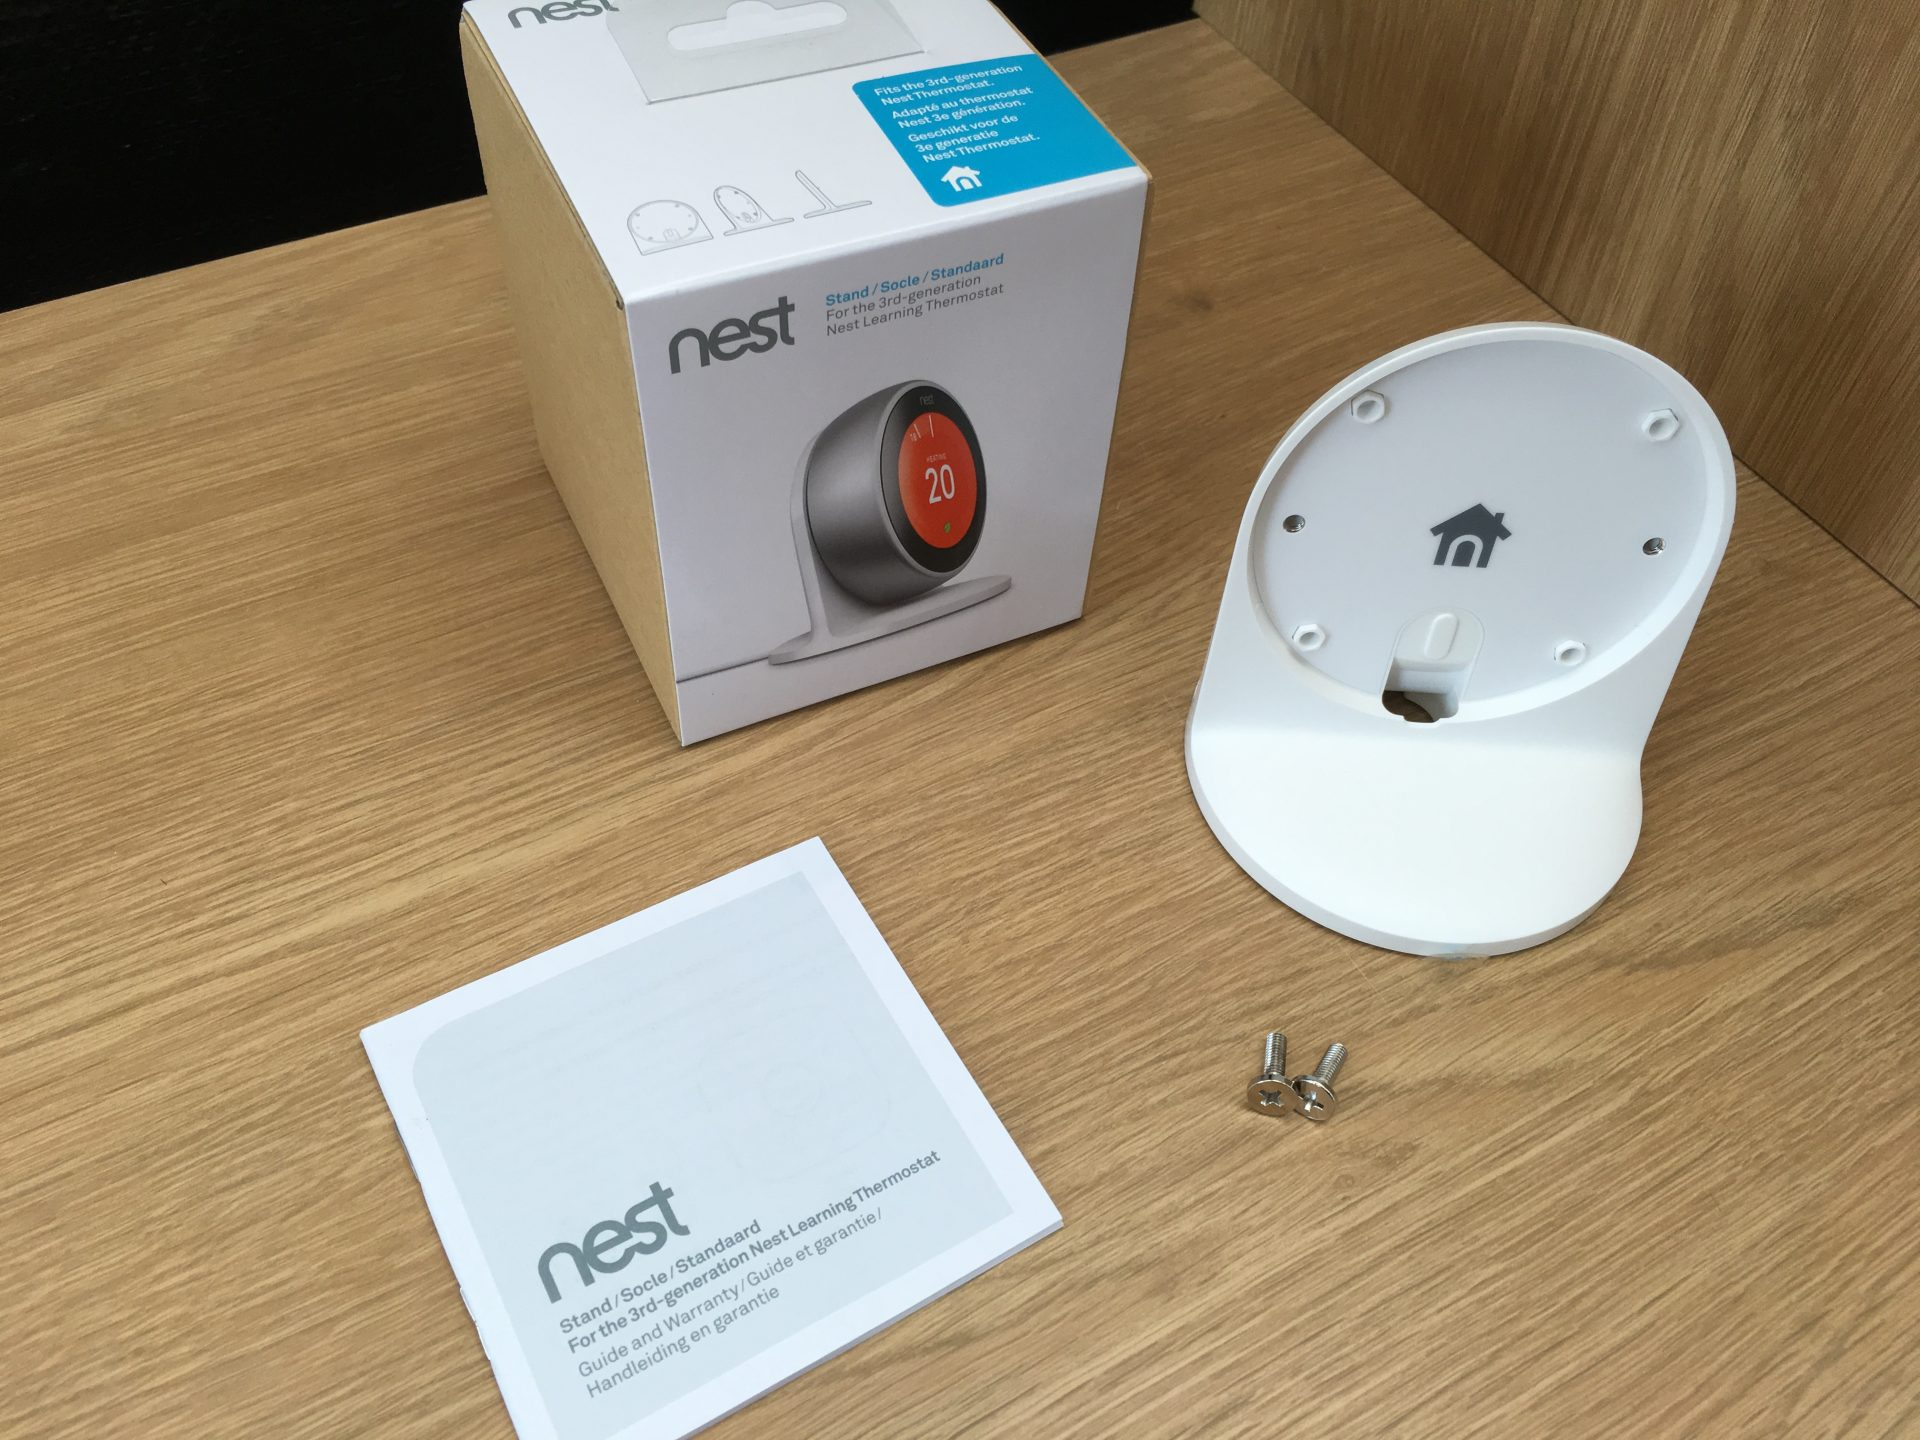 Nest stand